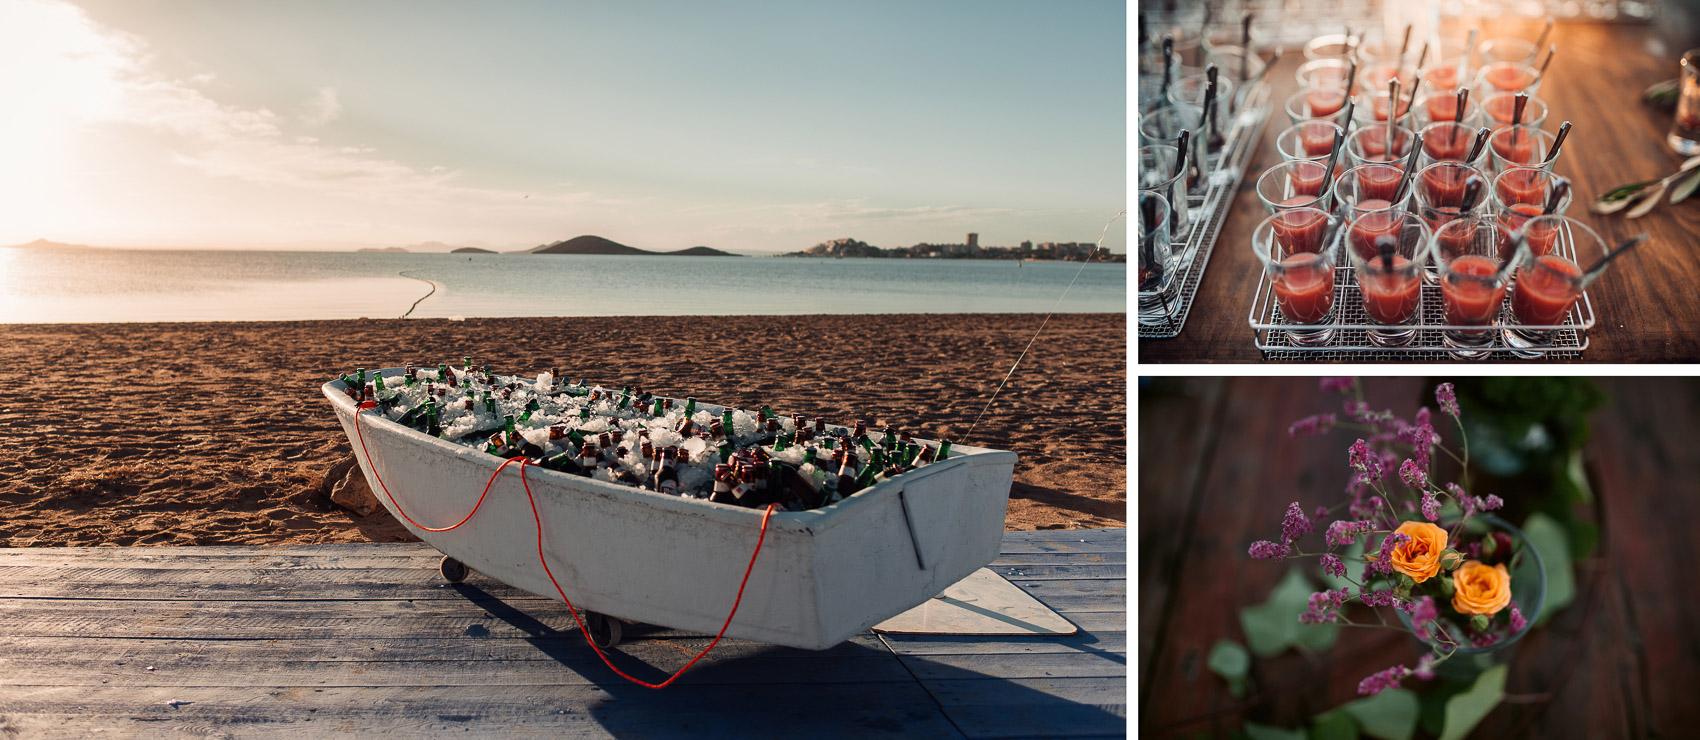 decoracion comida beach cerveza aperitivos flores detalles valisse